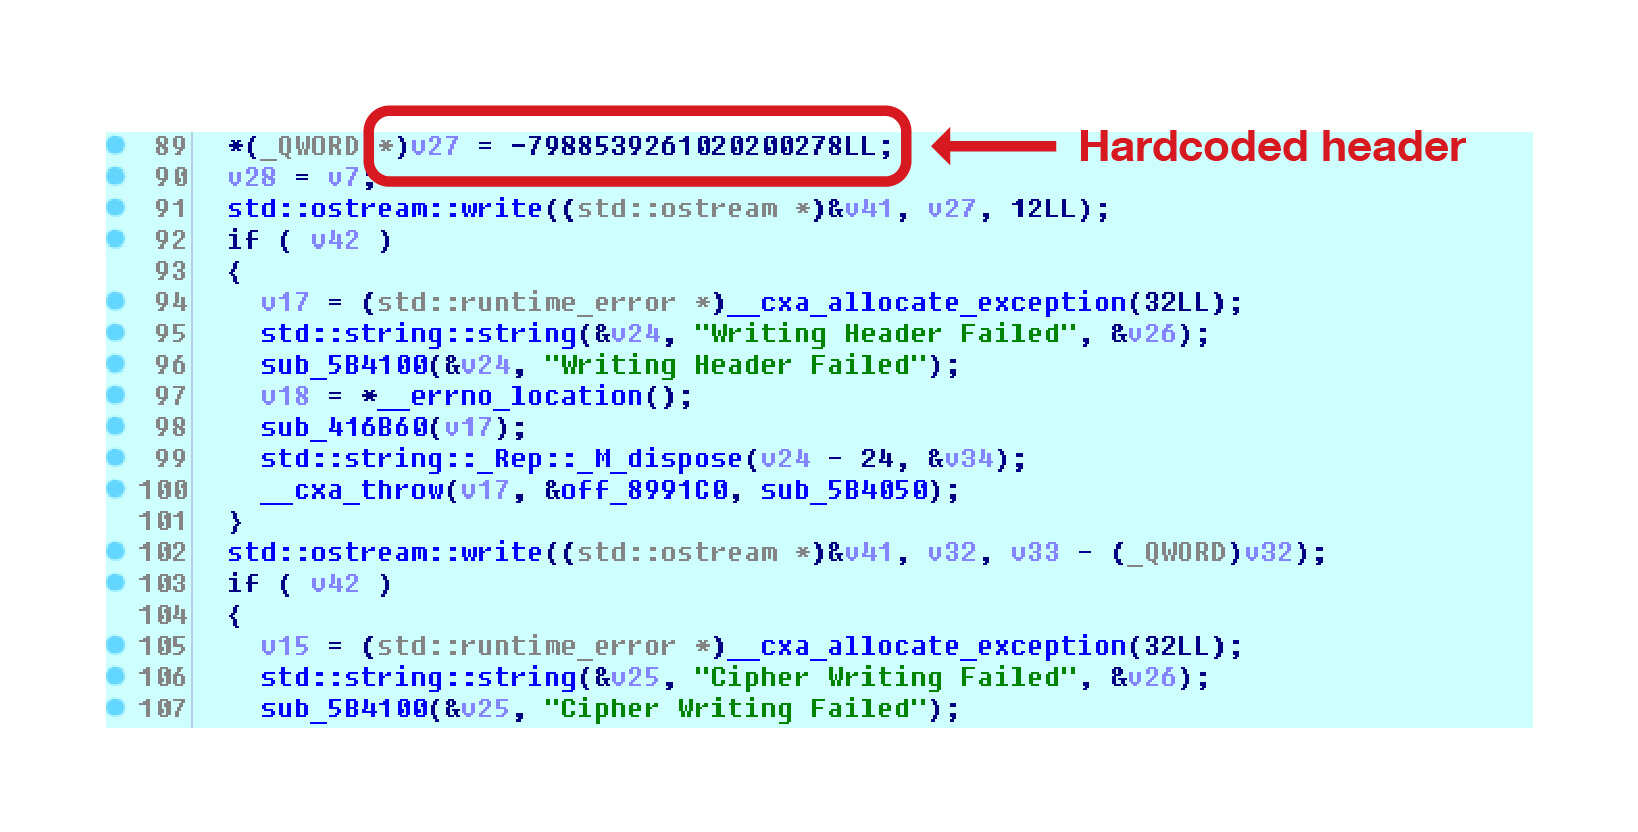 Adding code to header